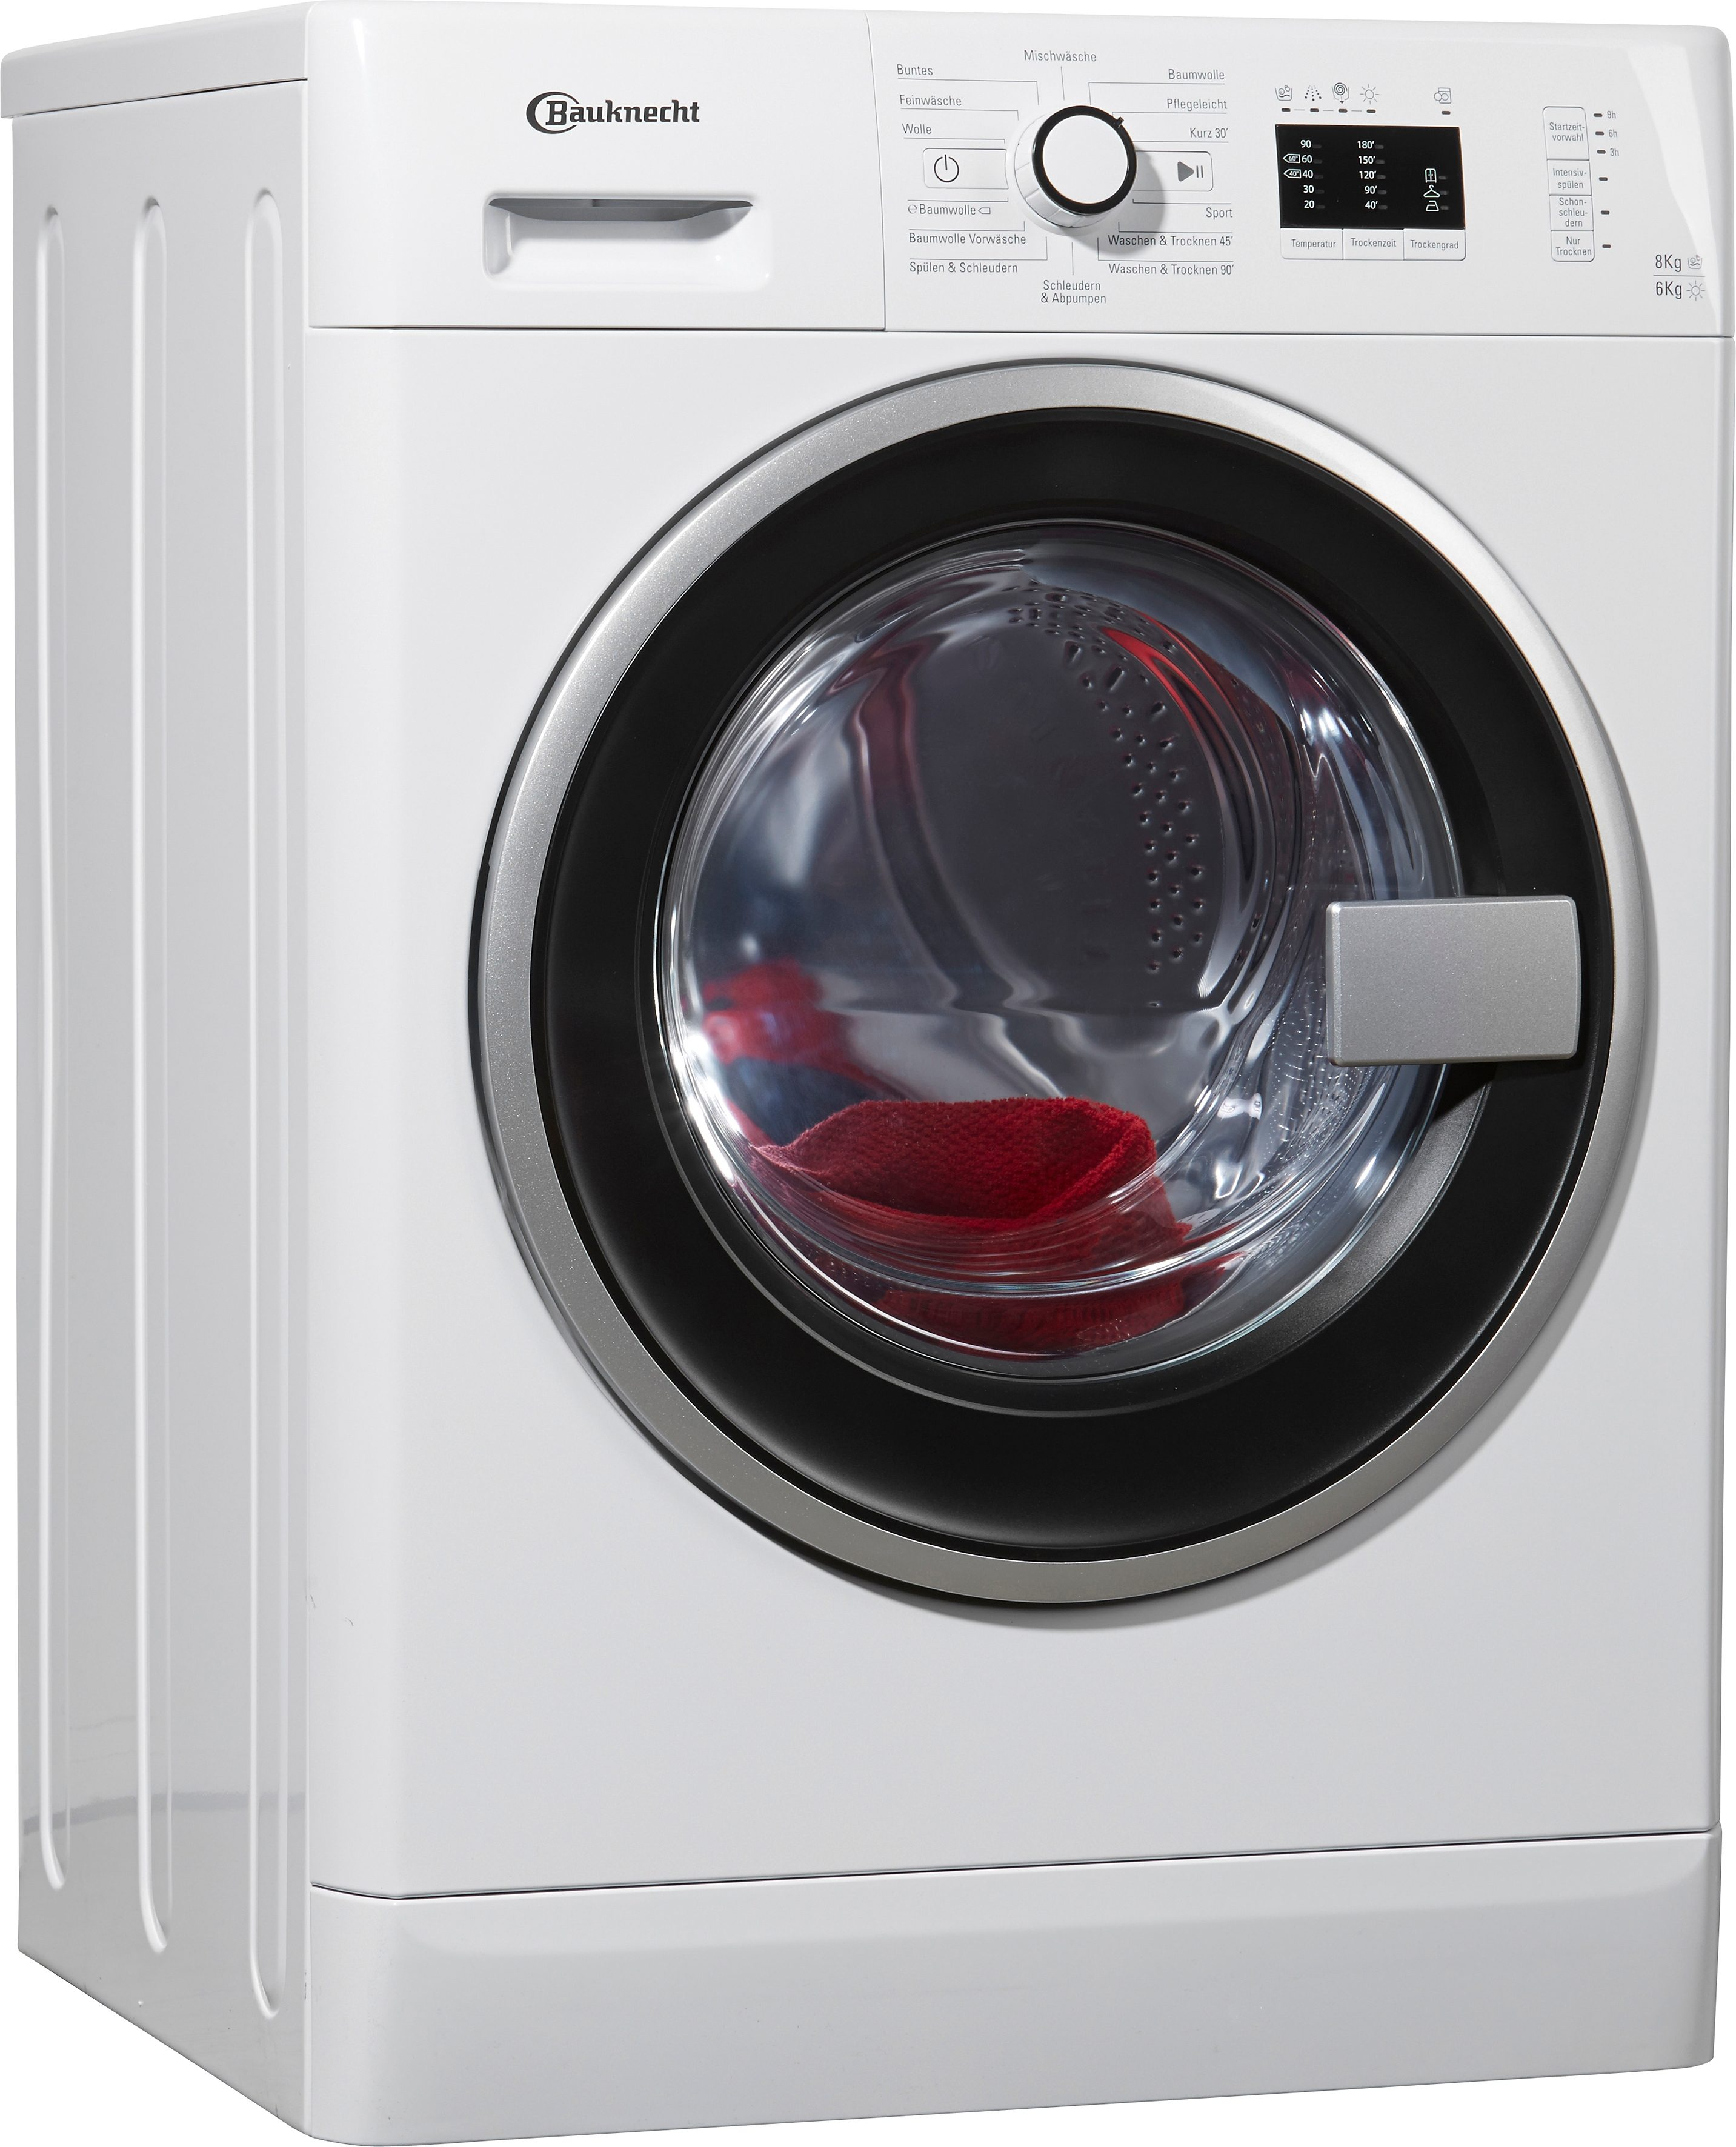 BAUKNECHT Waschtrockner WATK Prime 8612, 8 kg/6 kg, 1200 U/Min